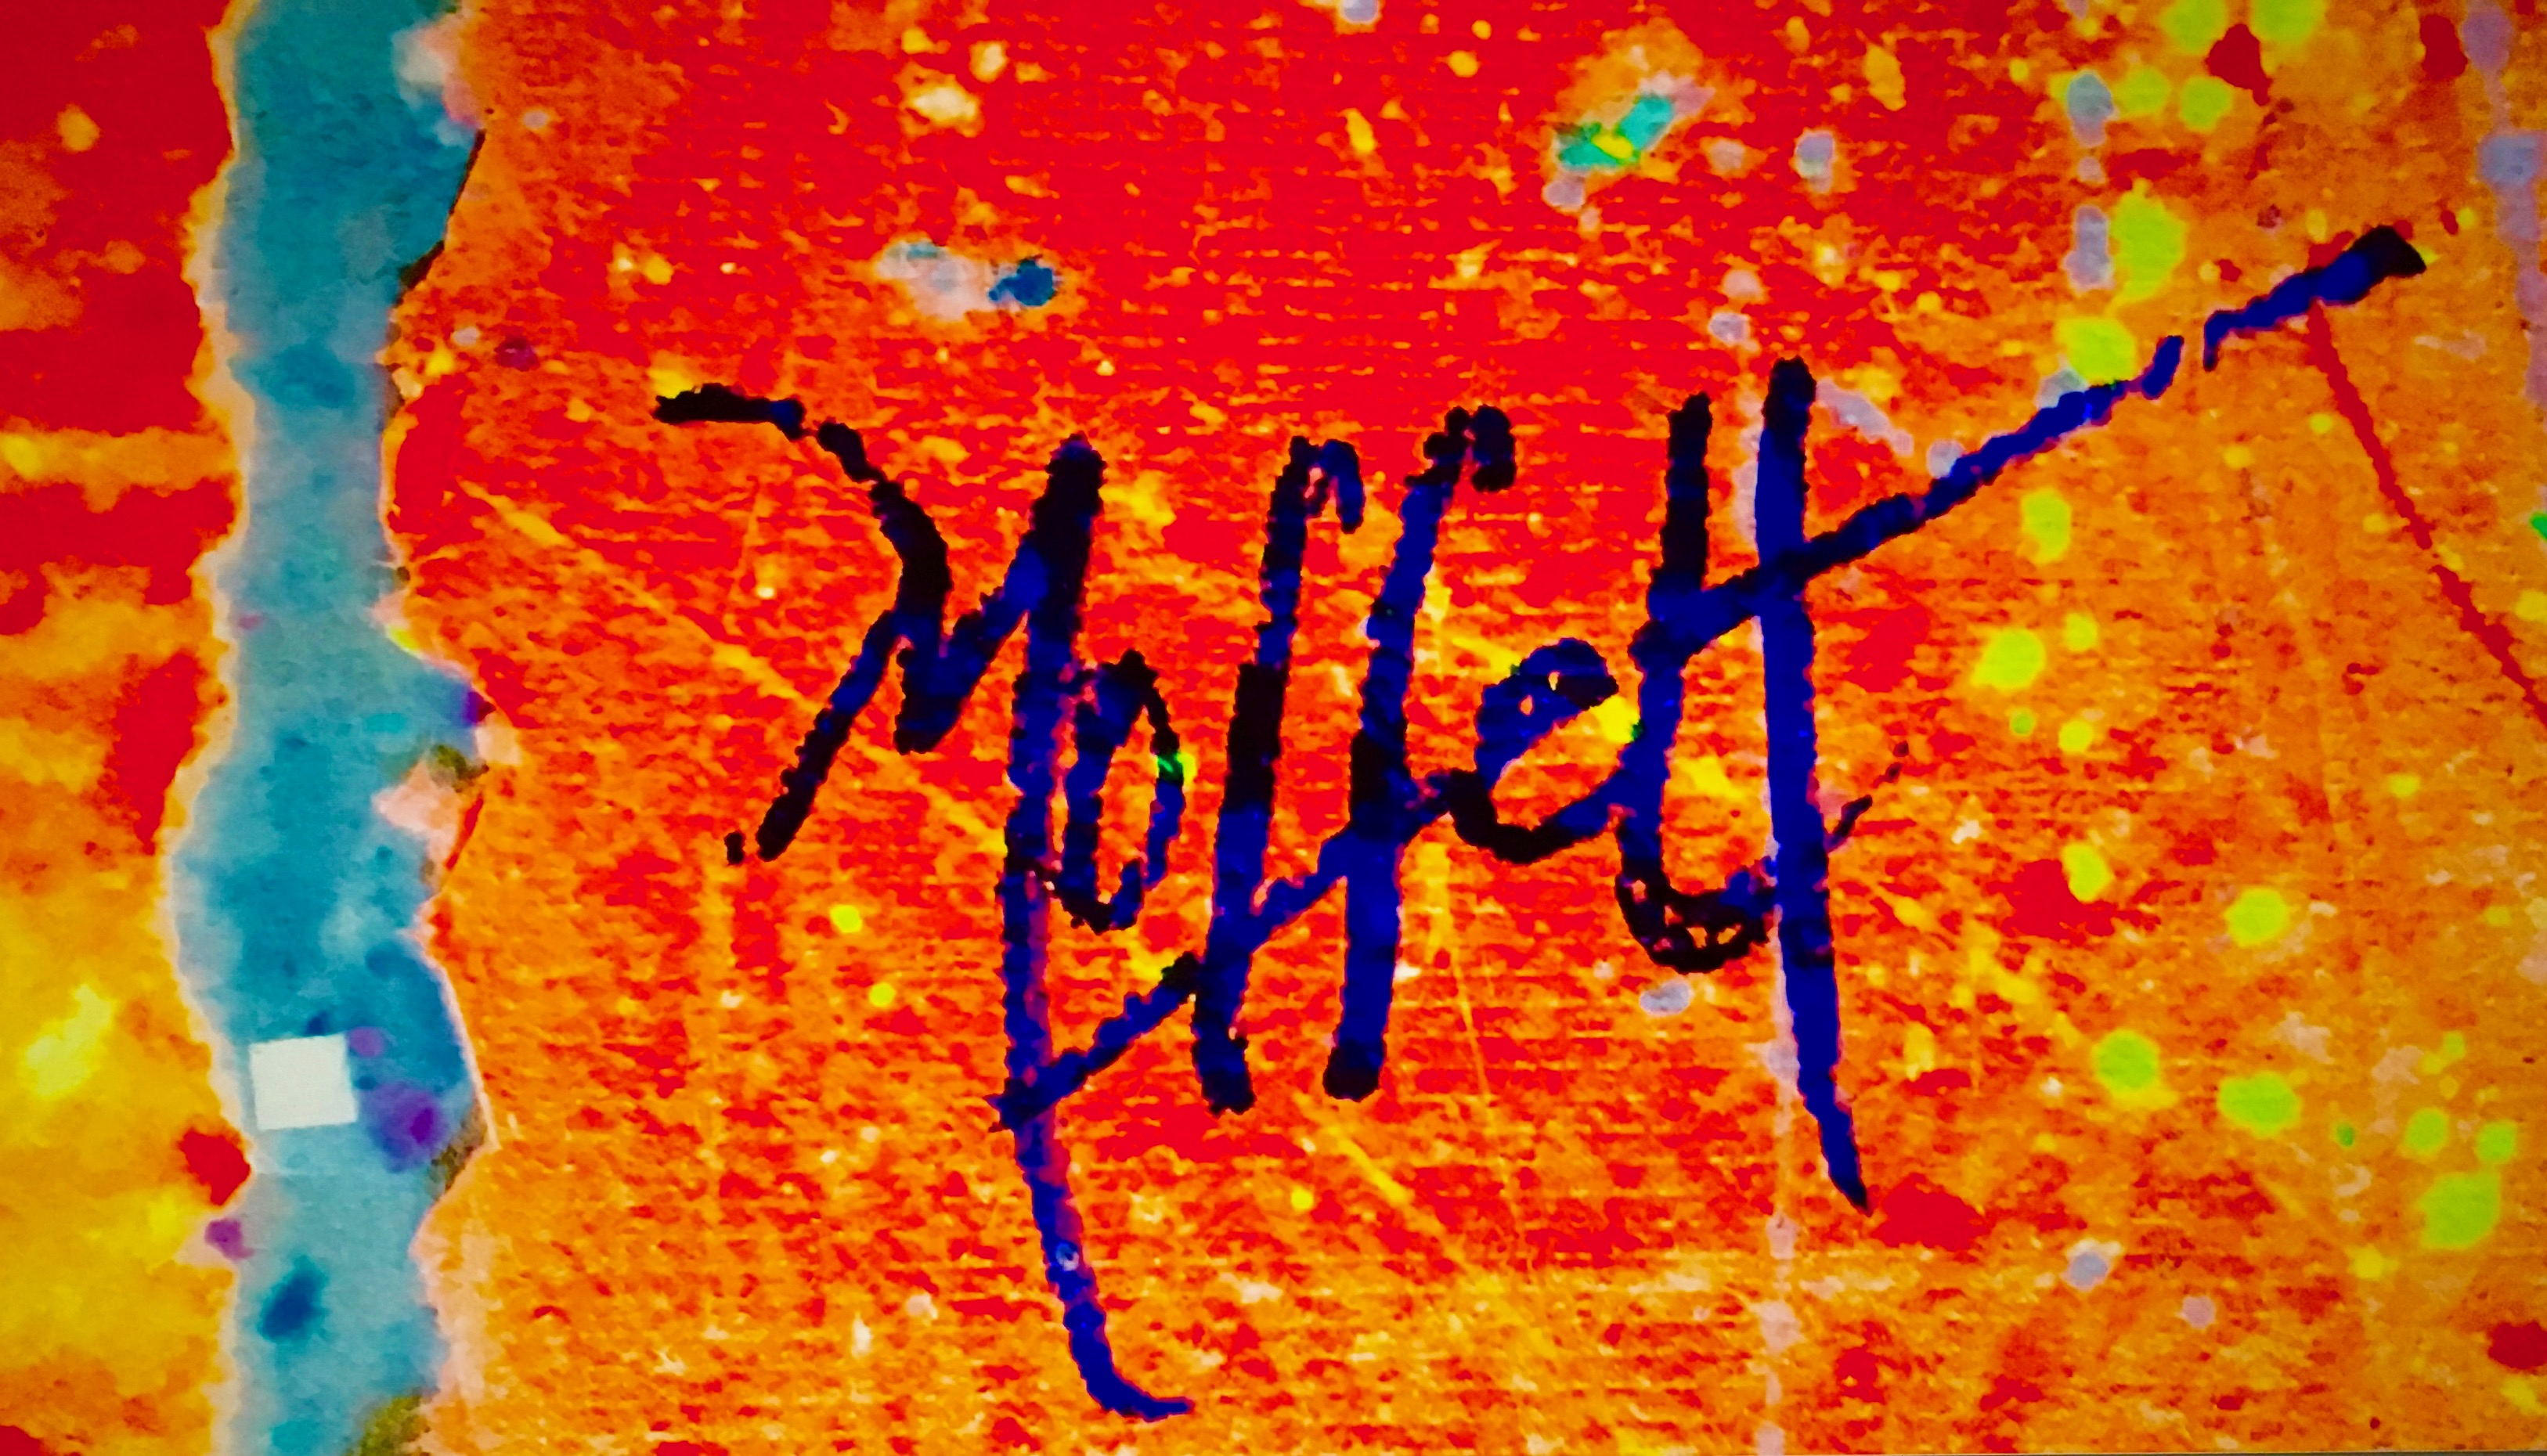 MOFFETT's Signature